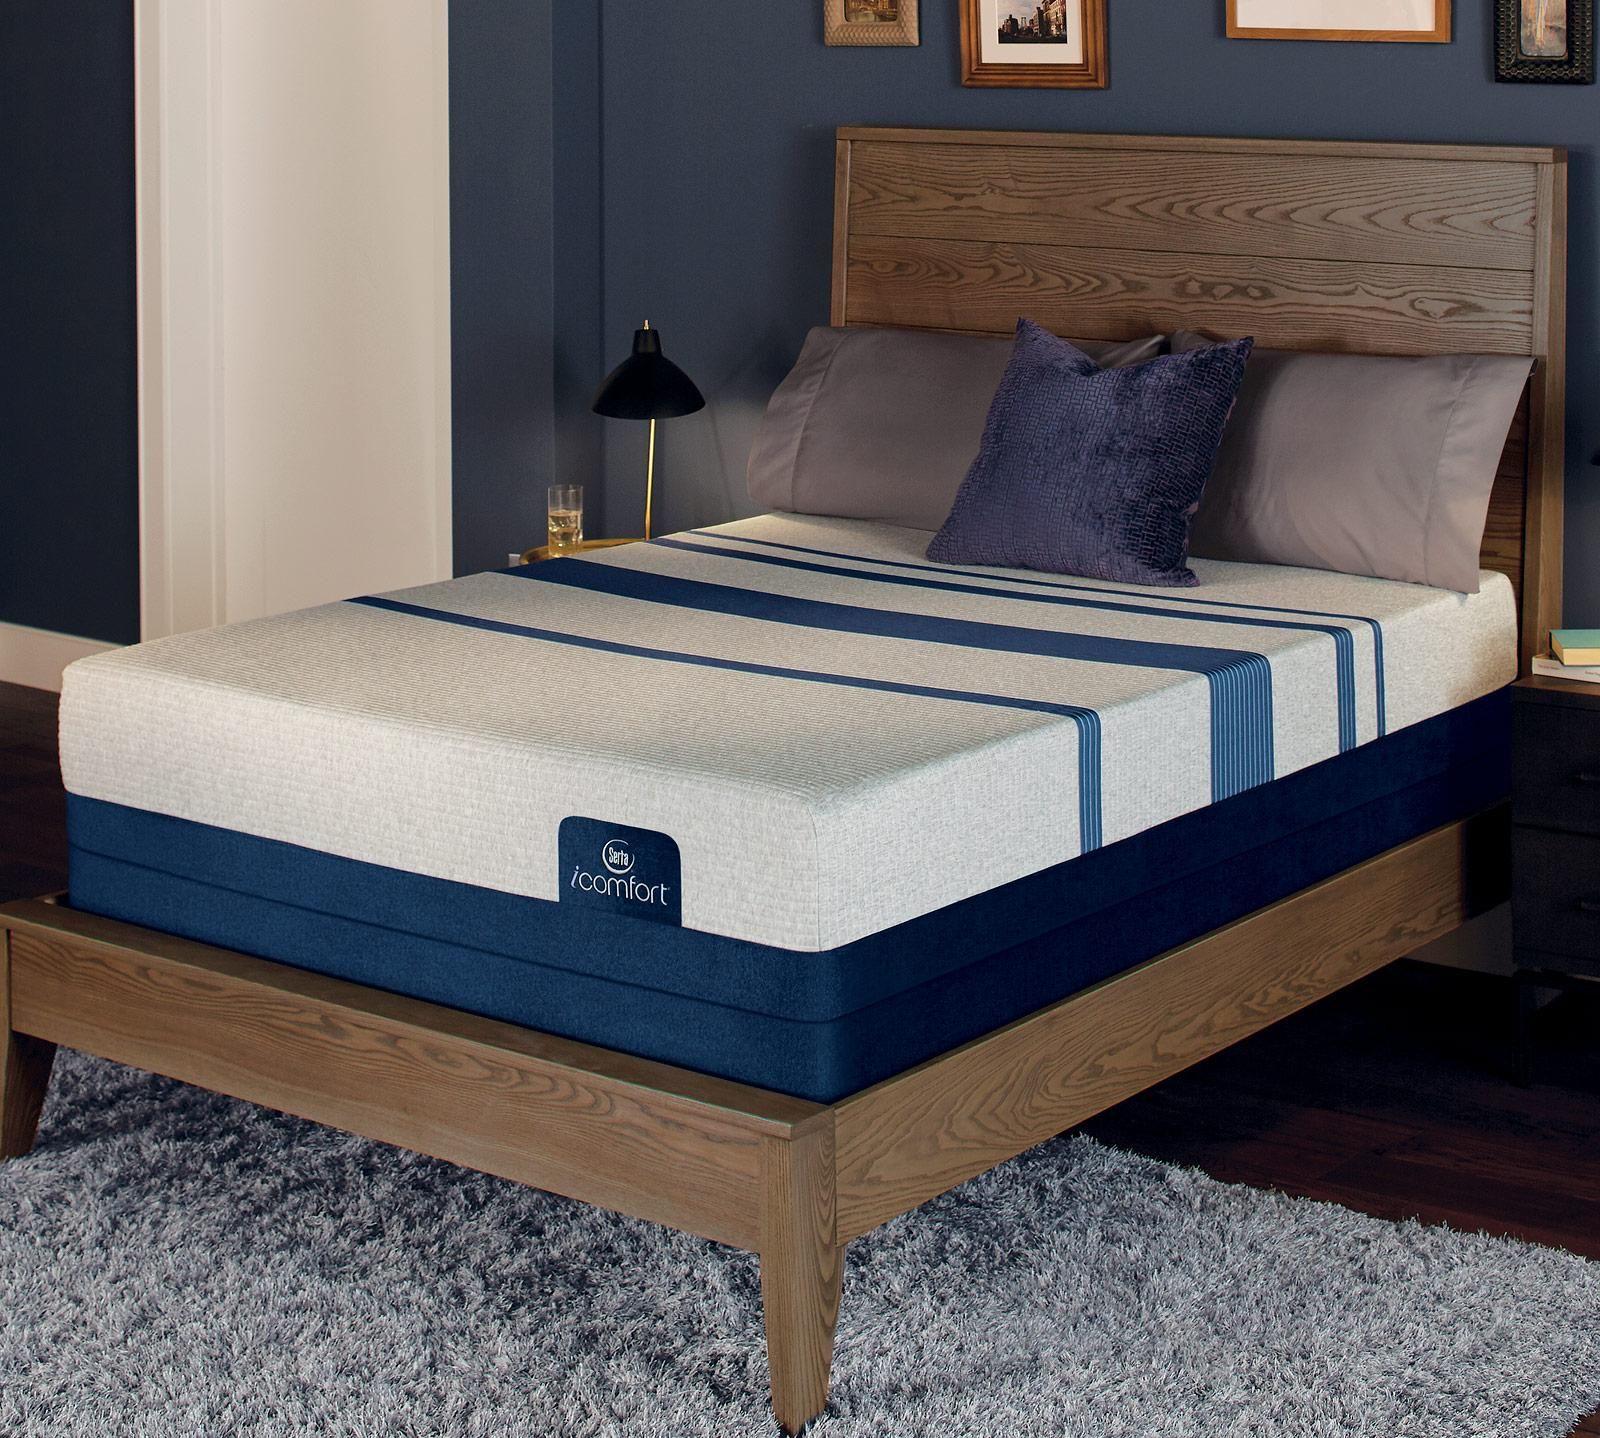 Blue touch 500 plush 2300 mattress buying